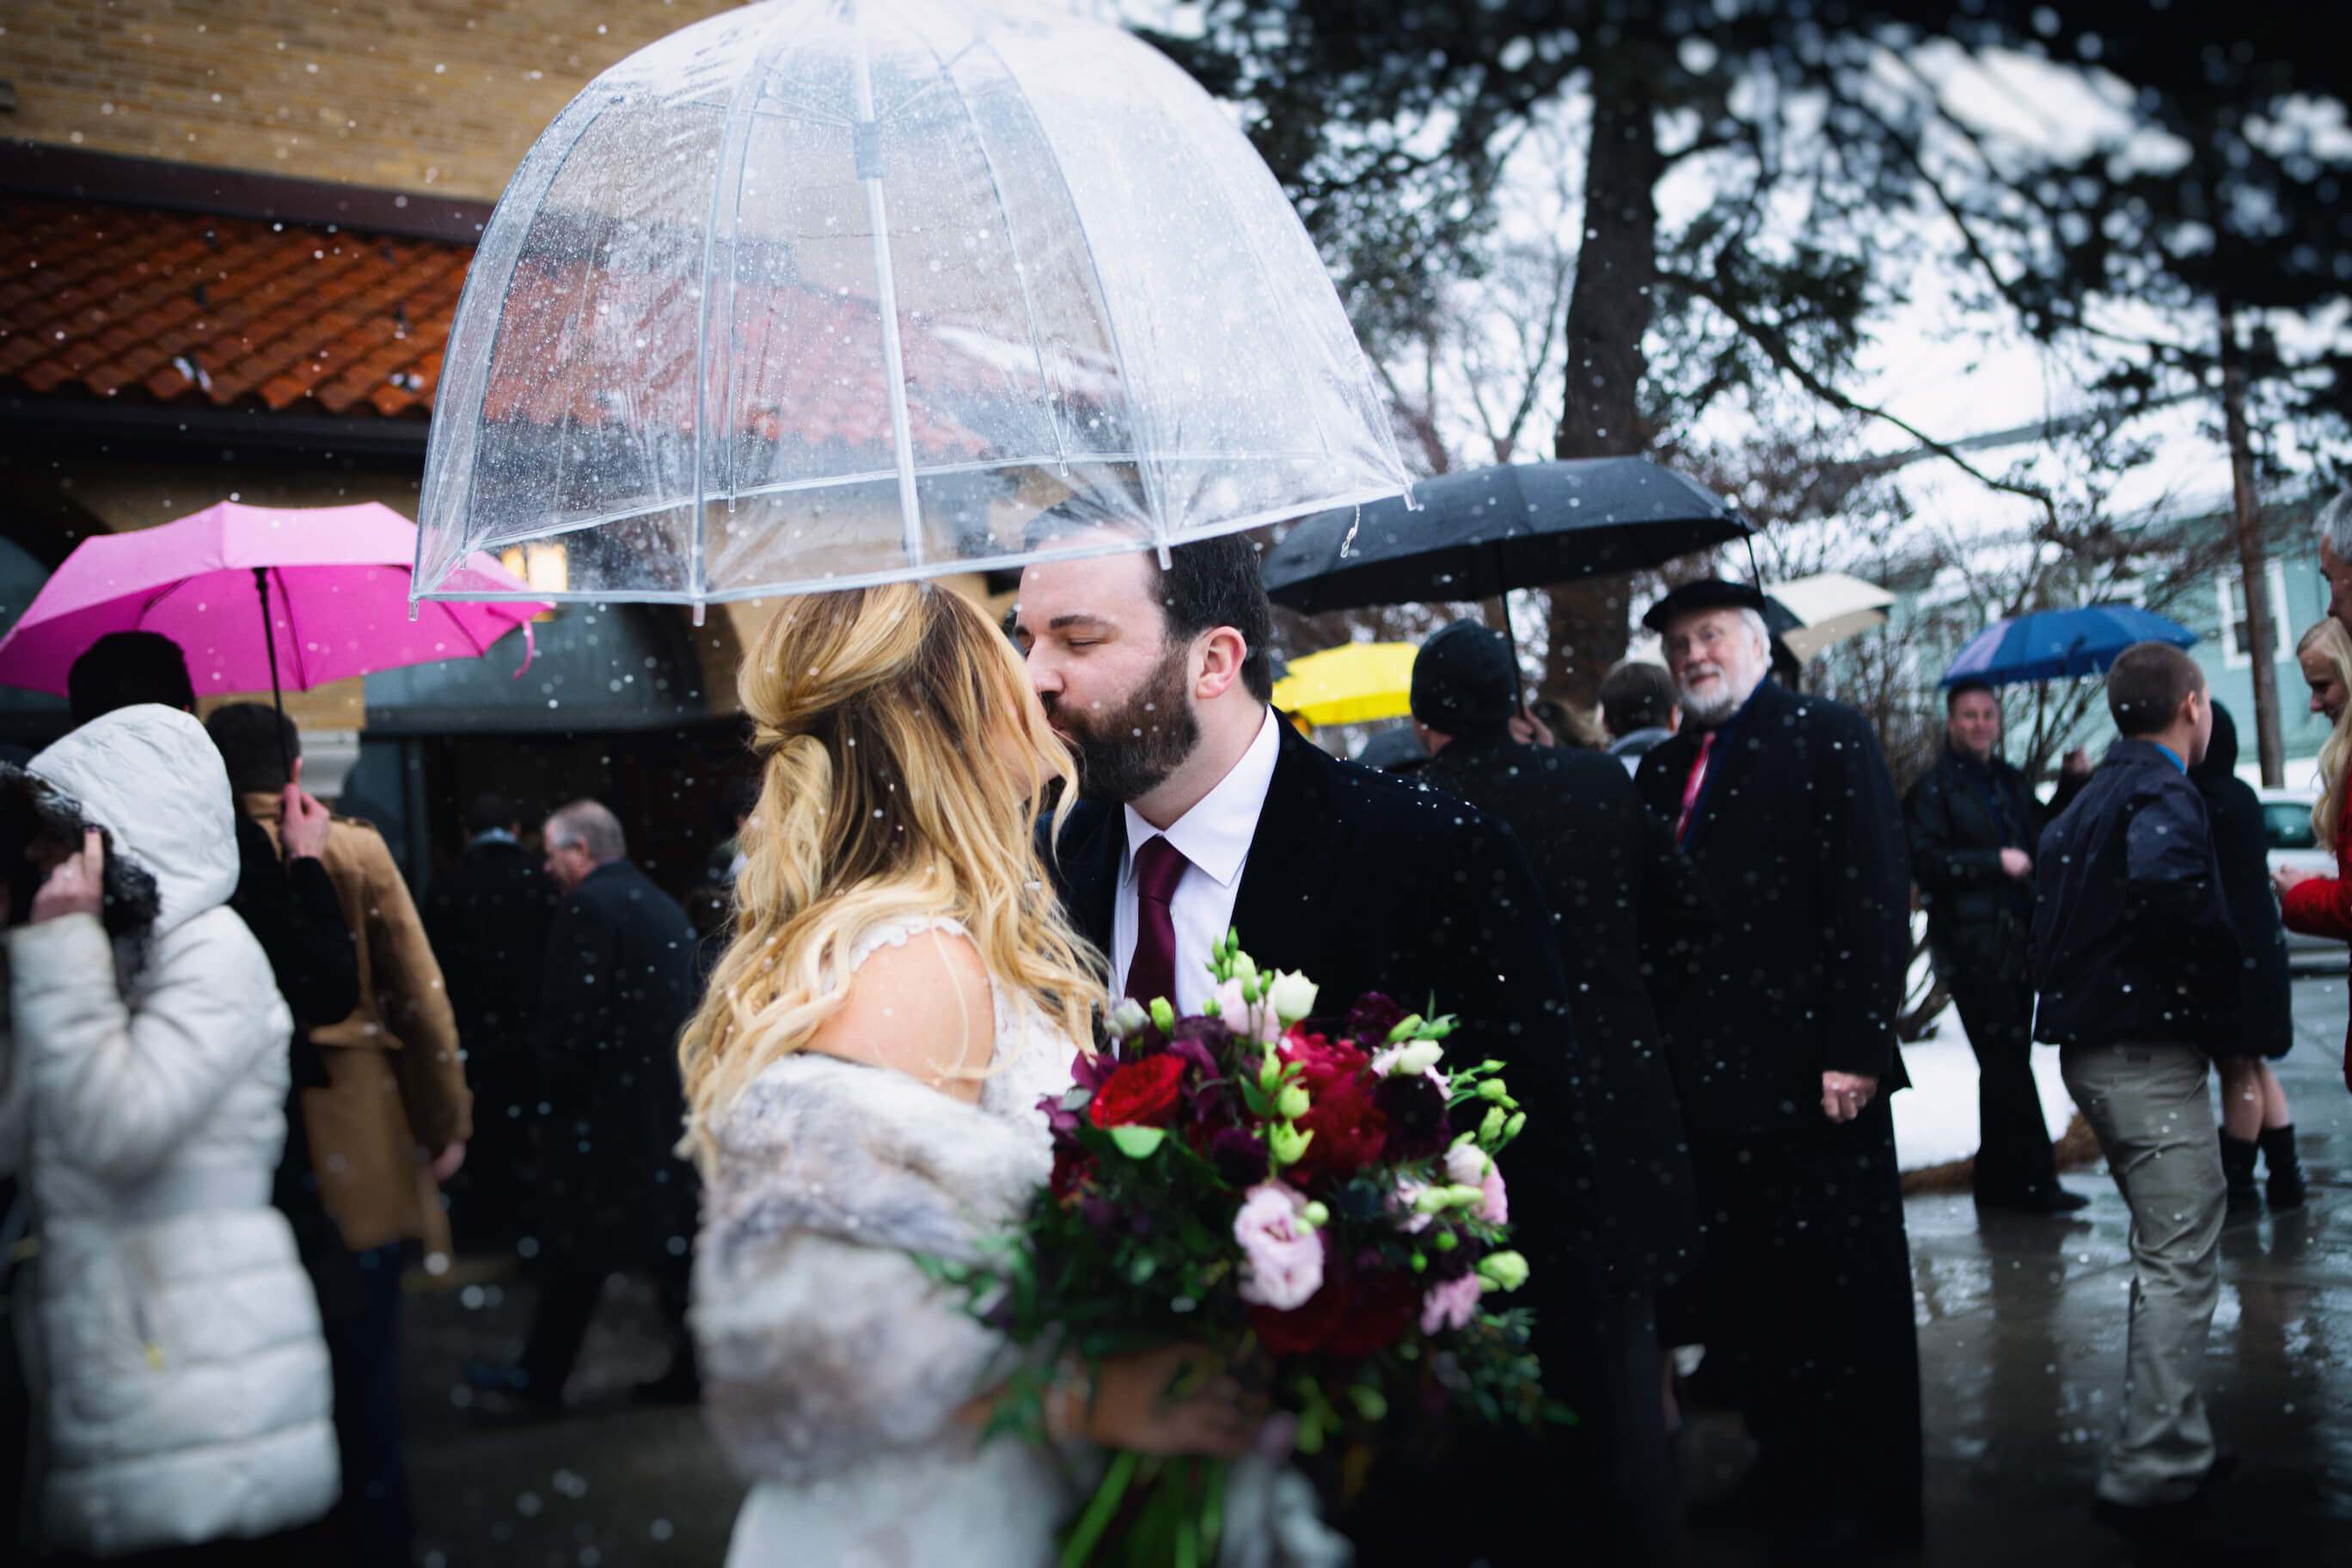 umbrella wedding, snow wedding, blizzard, Omaha, Nebraska